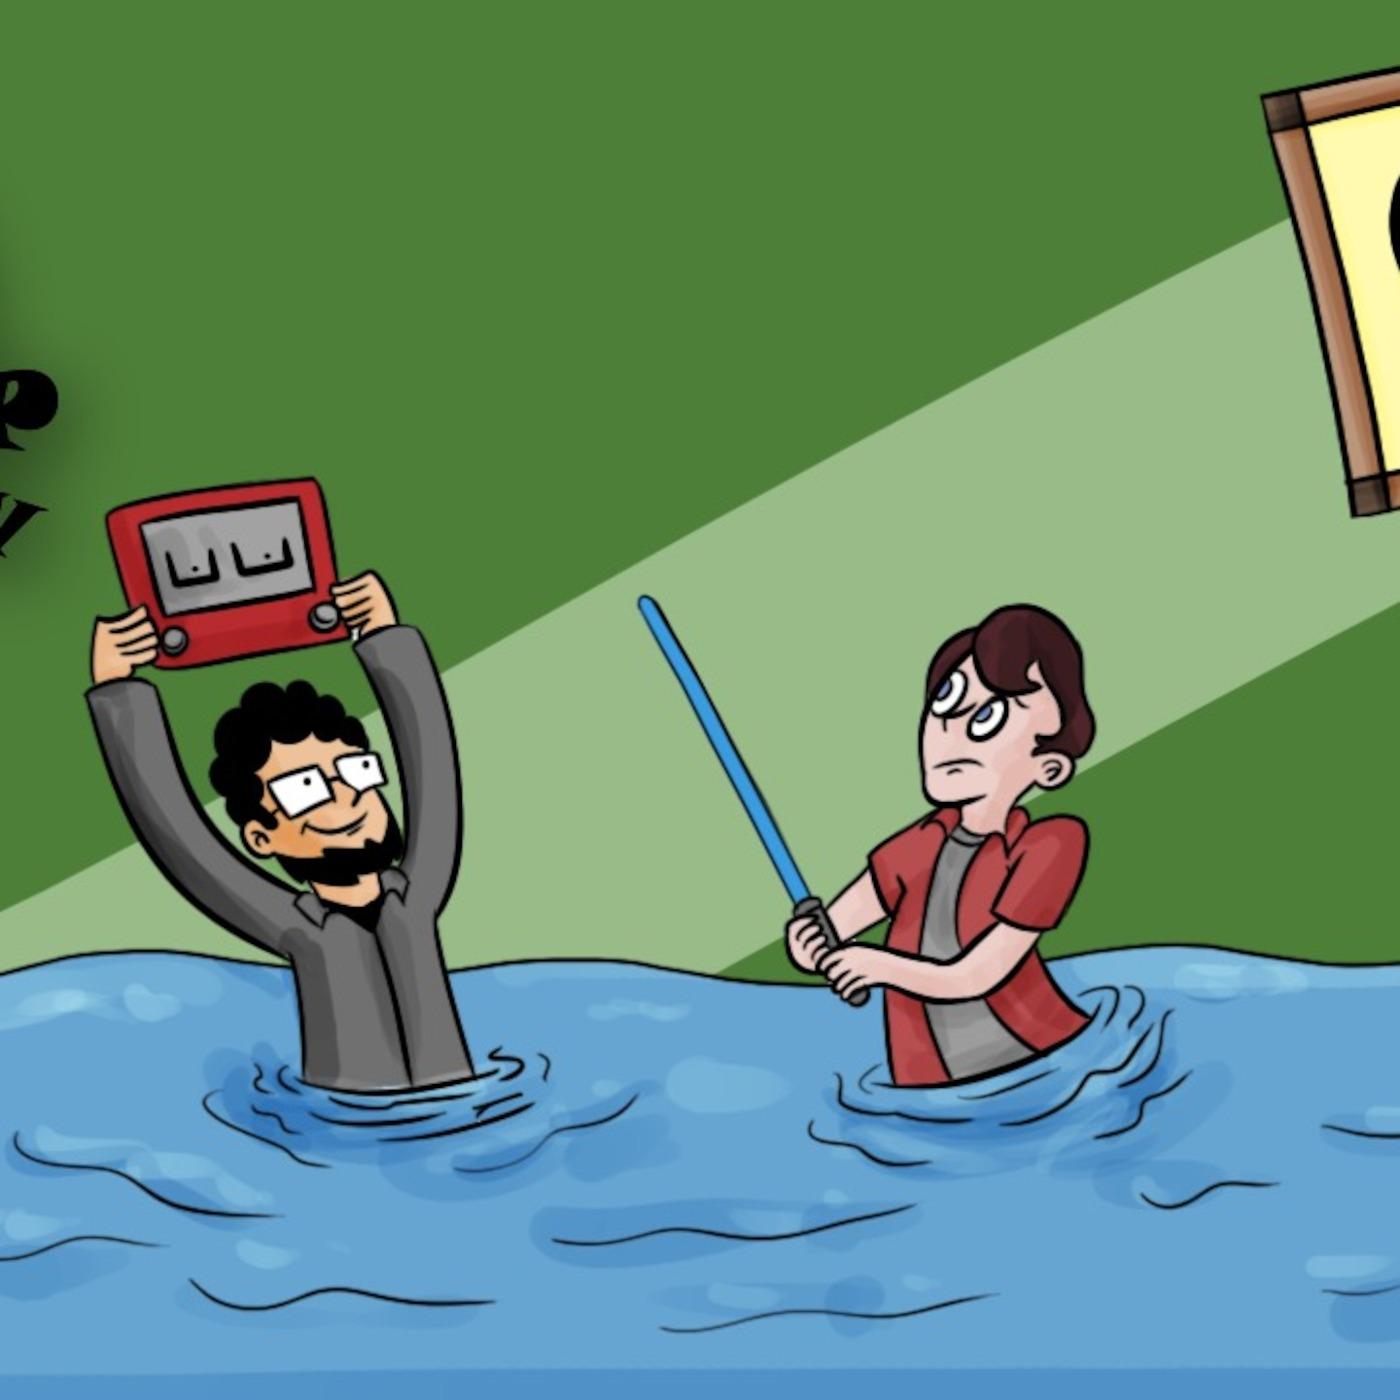 Episode 30 - Water Level Rising